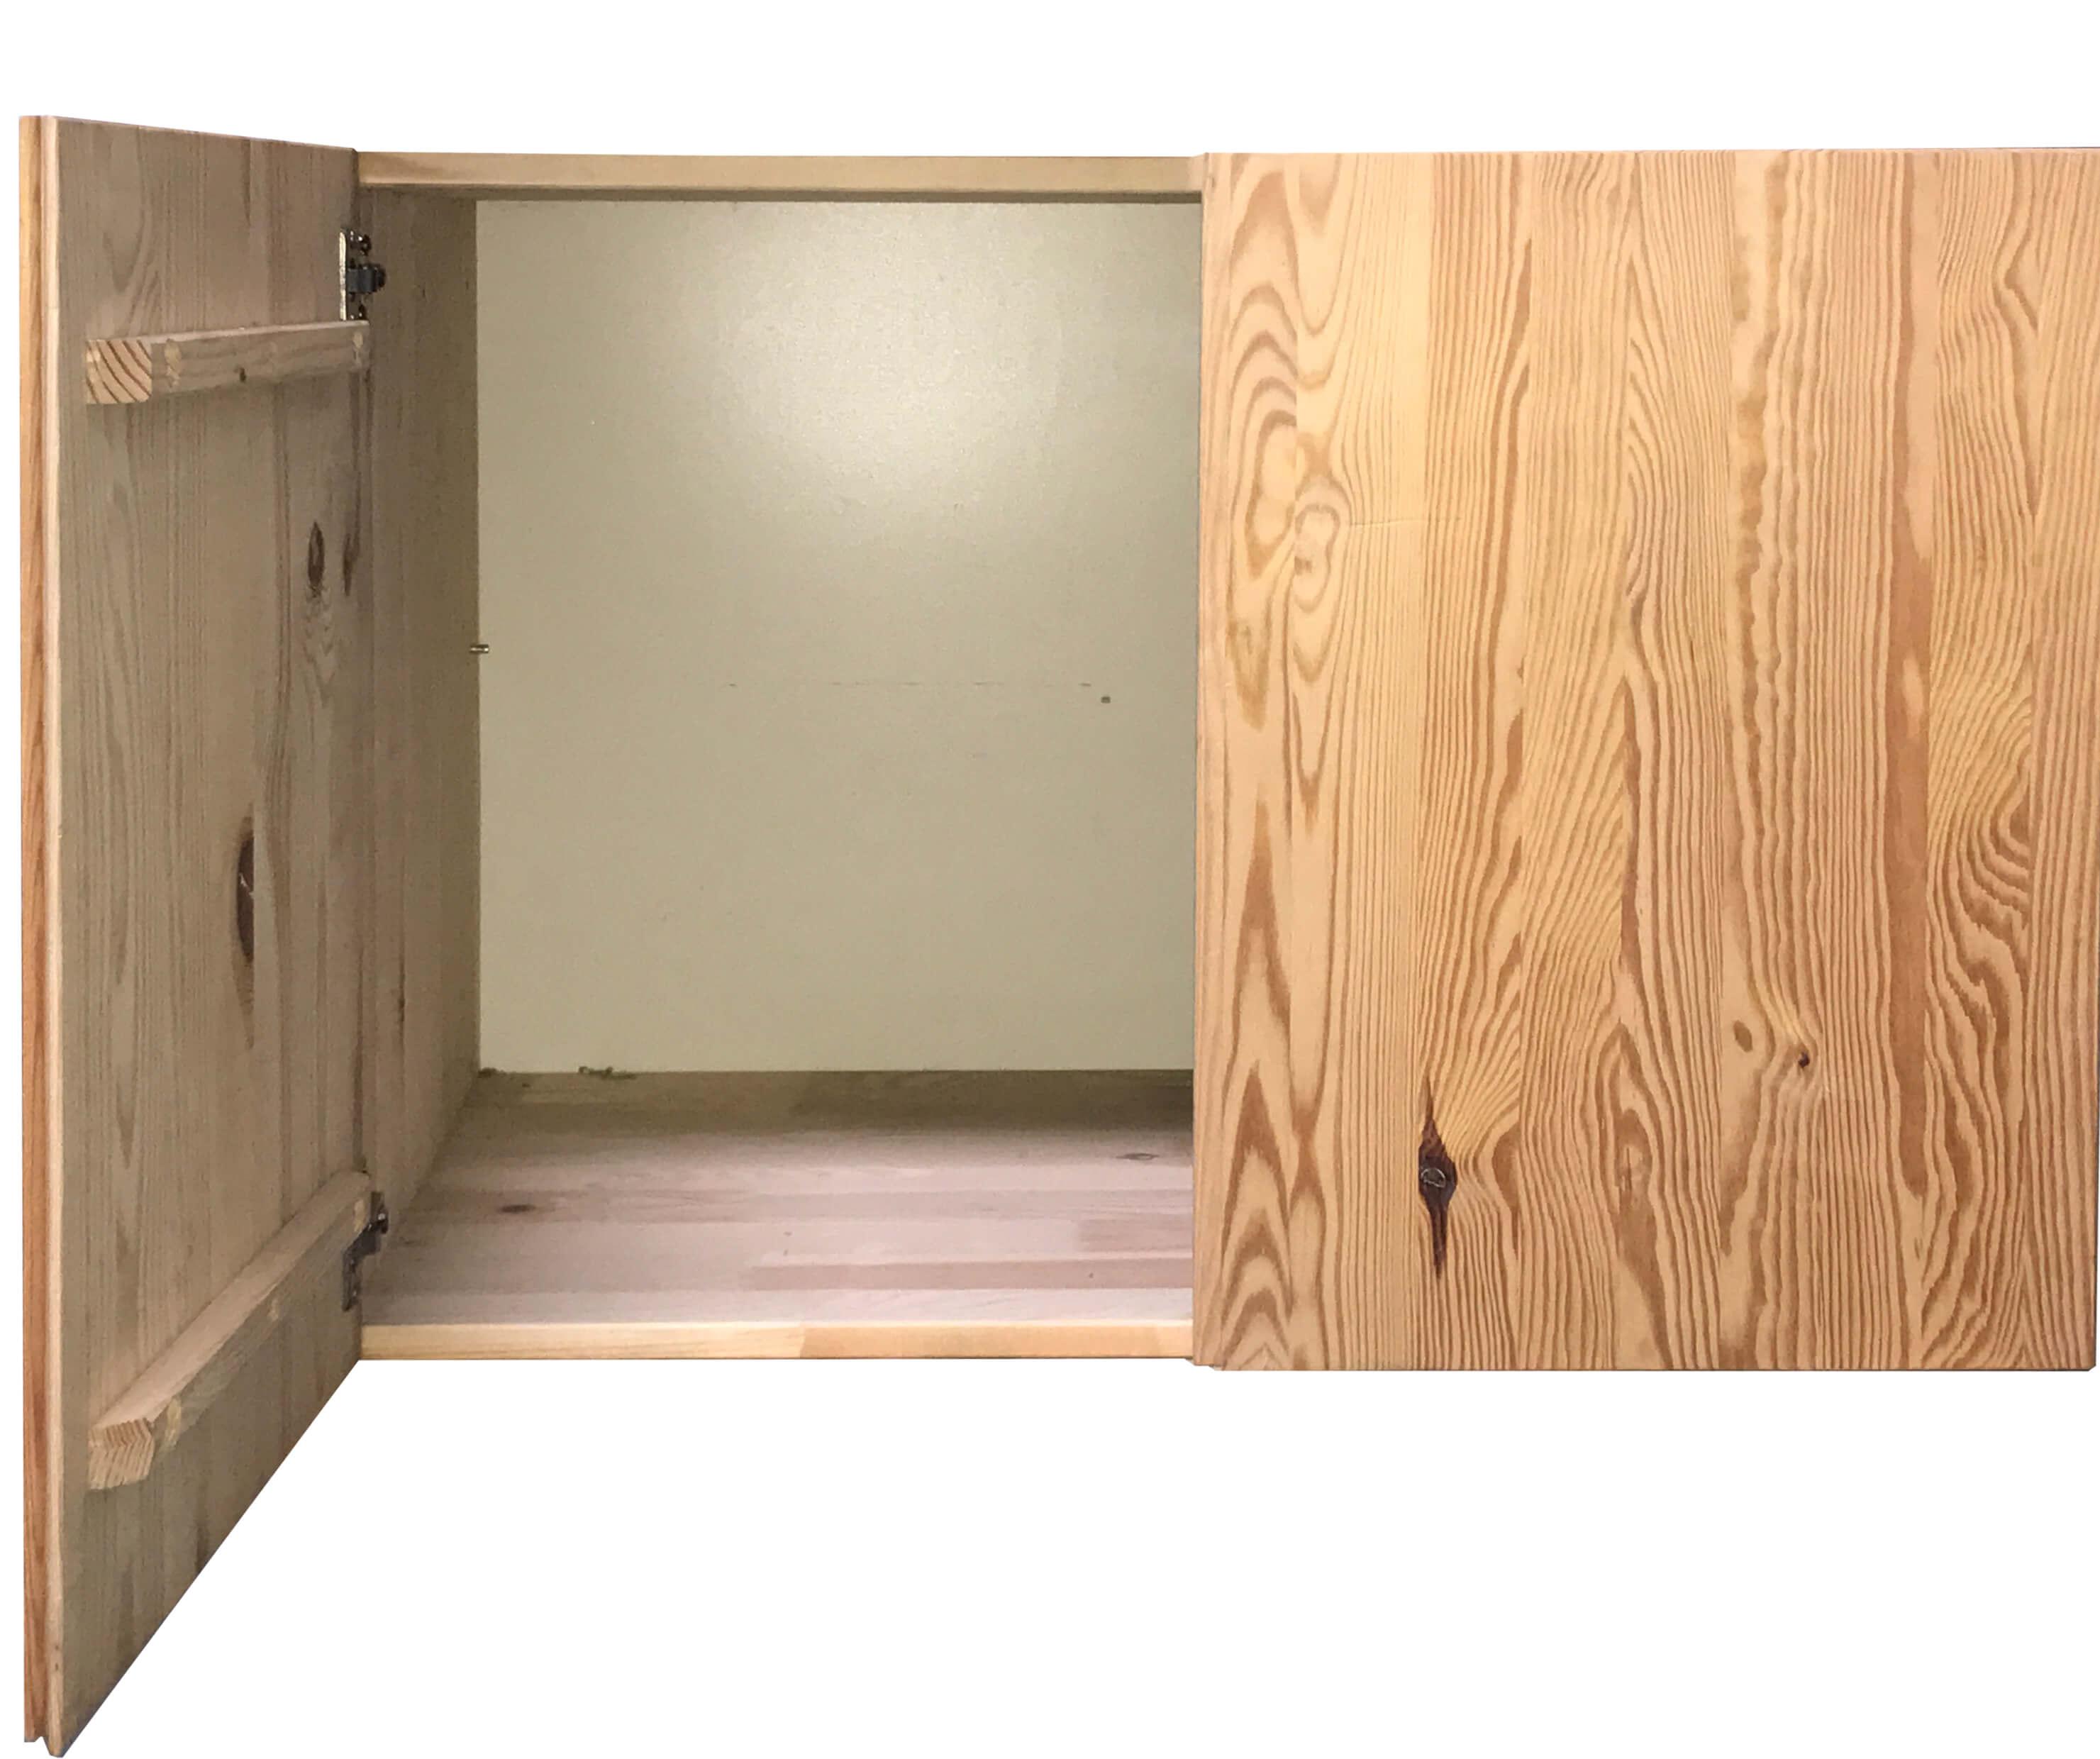 ikea ivar schrank mit 2 t ren altes system 80x50x57cm. Black Bedroom Furniture Sets. Home Design Ideas